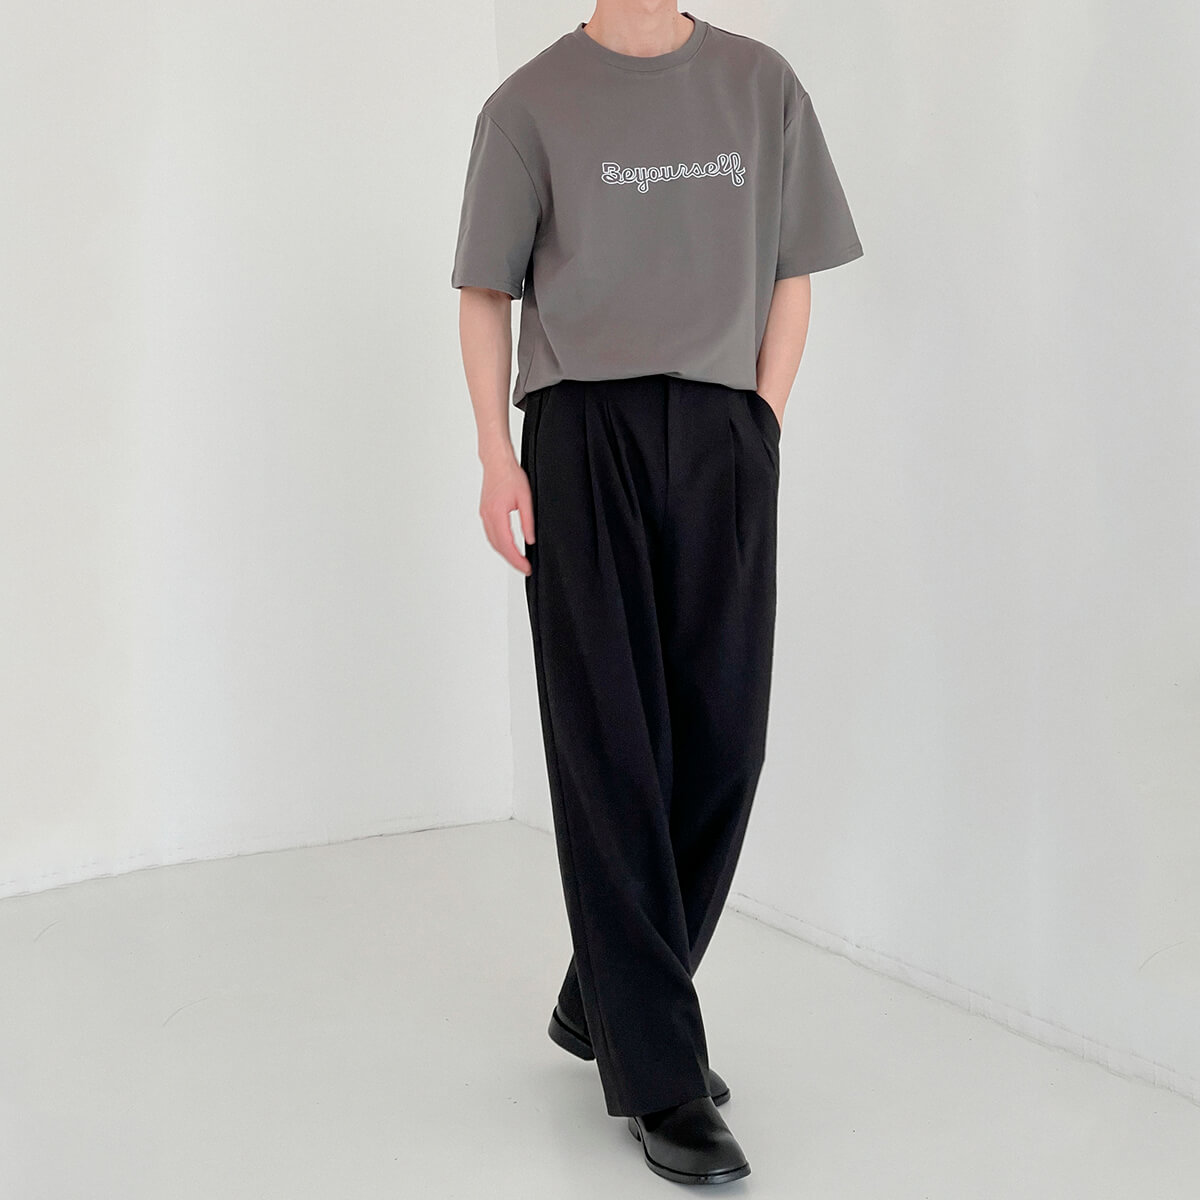 Футболка DAZO Studio T-shirt Embroidery Be Yourself (5)